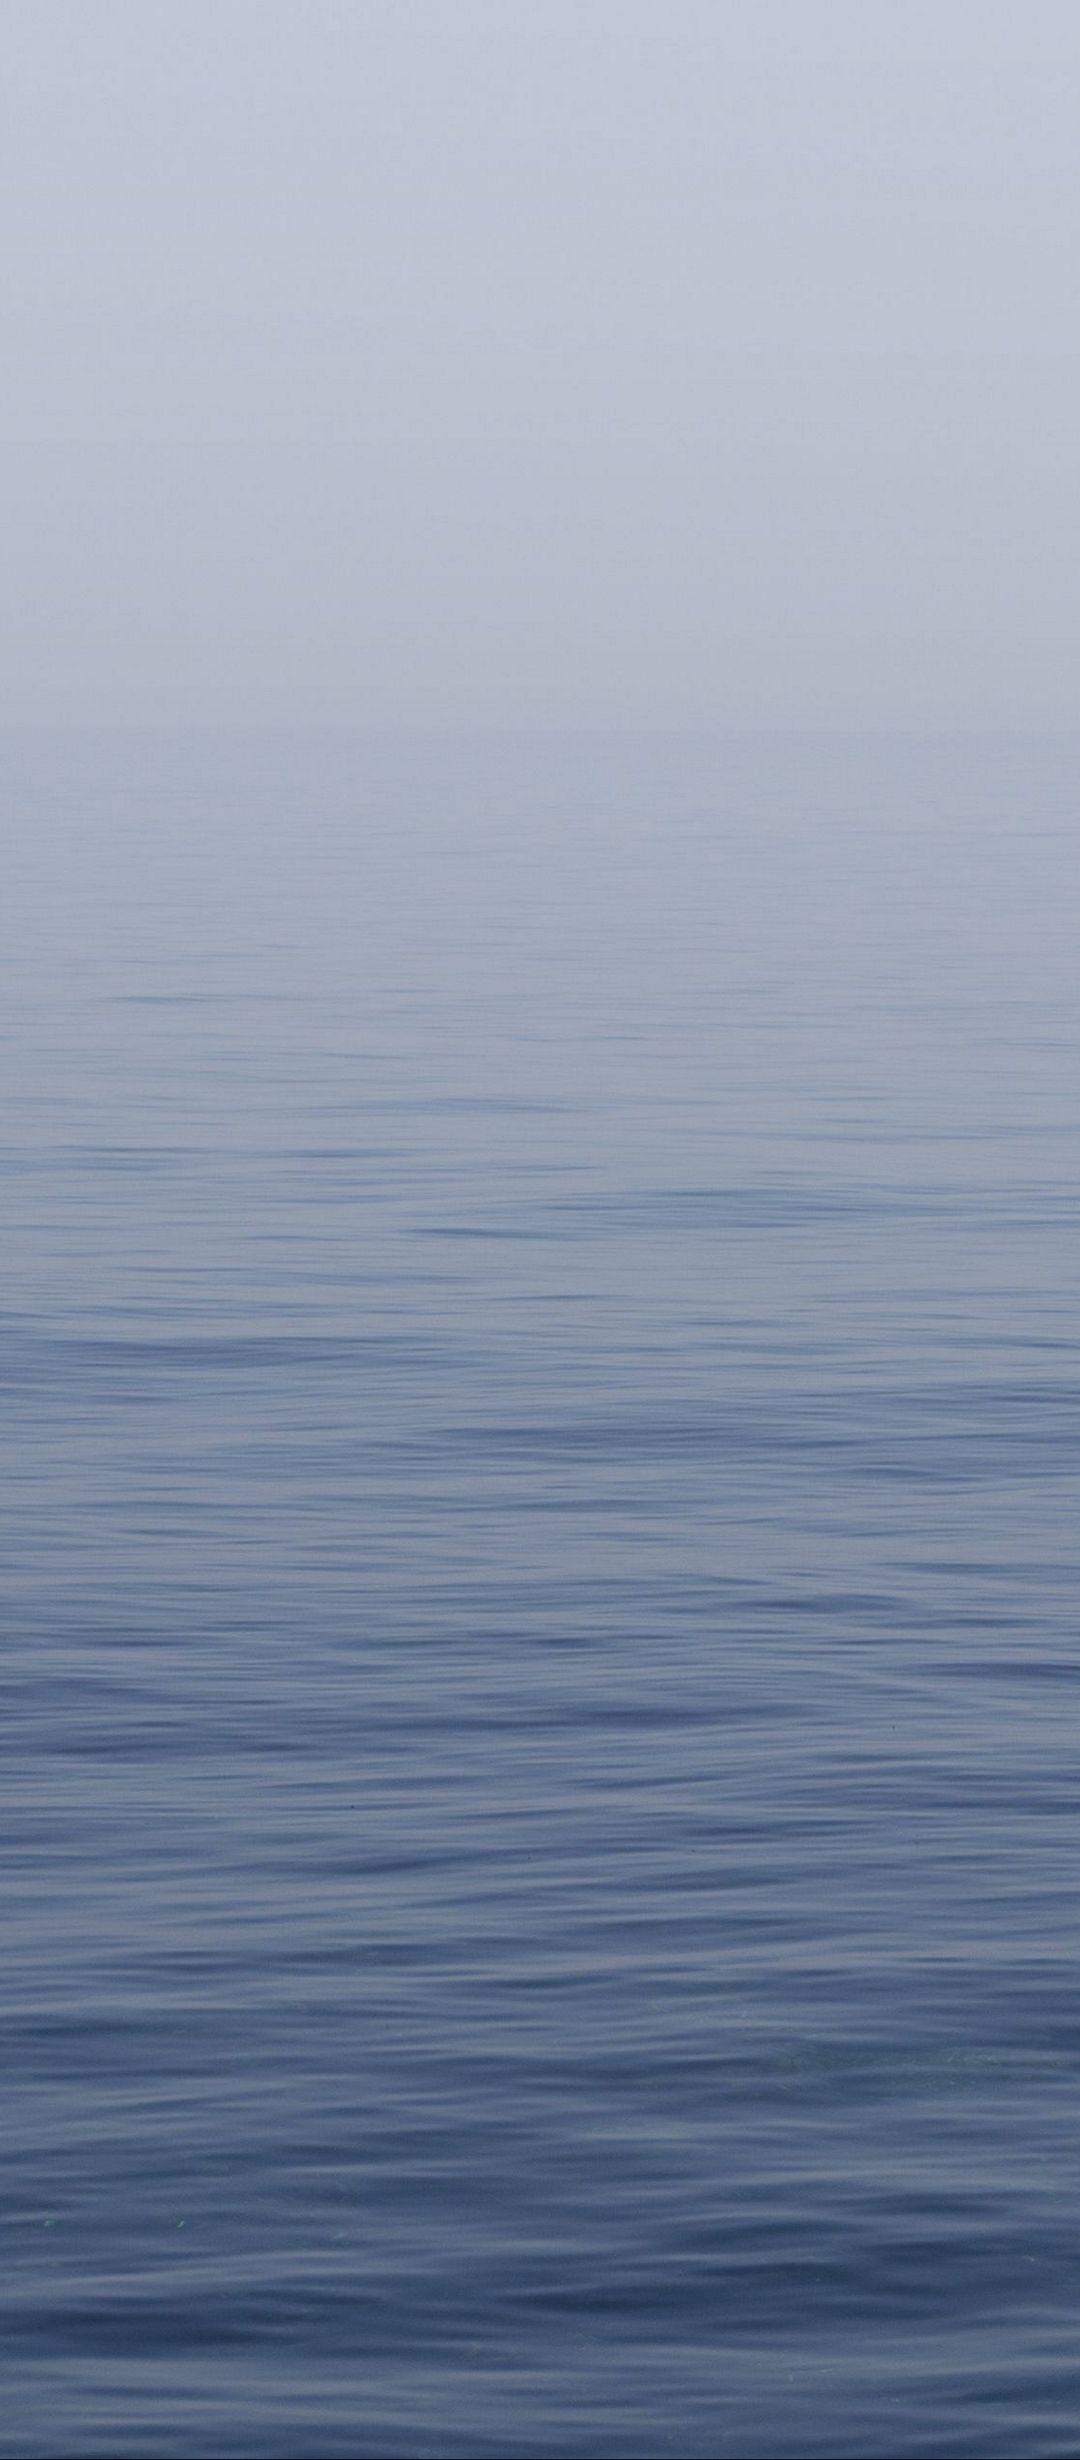 S9 S10 S10 Plus Water Ocean Blue Nature Wallpaper Galaxy